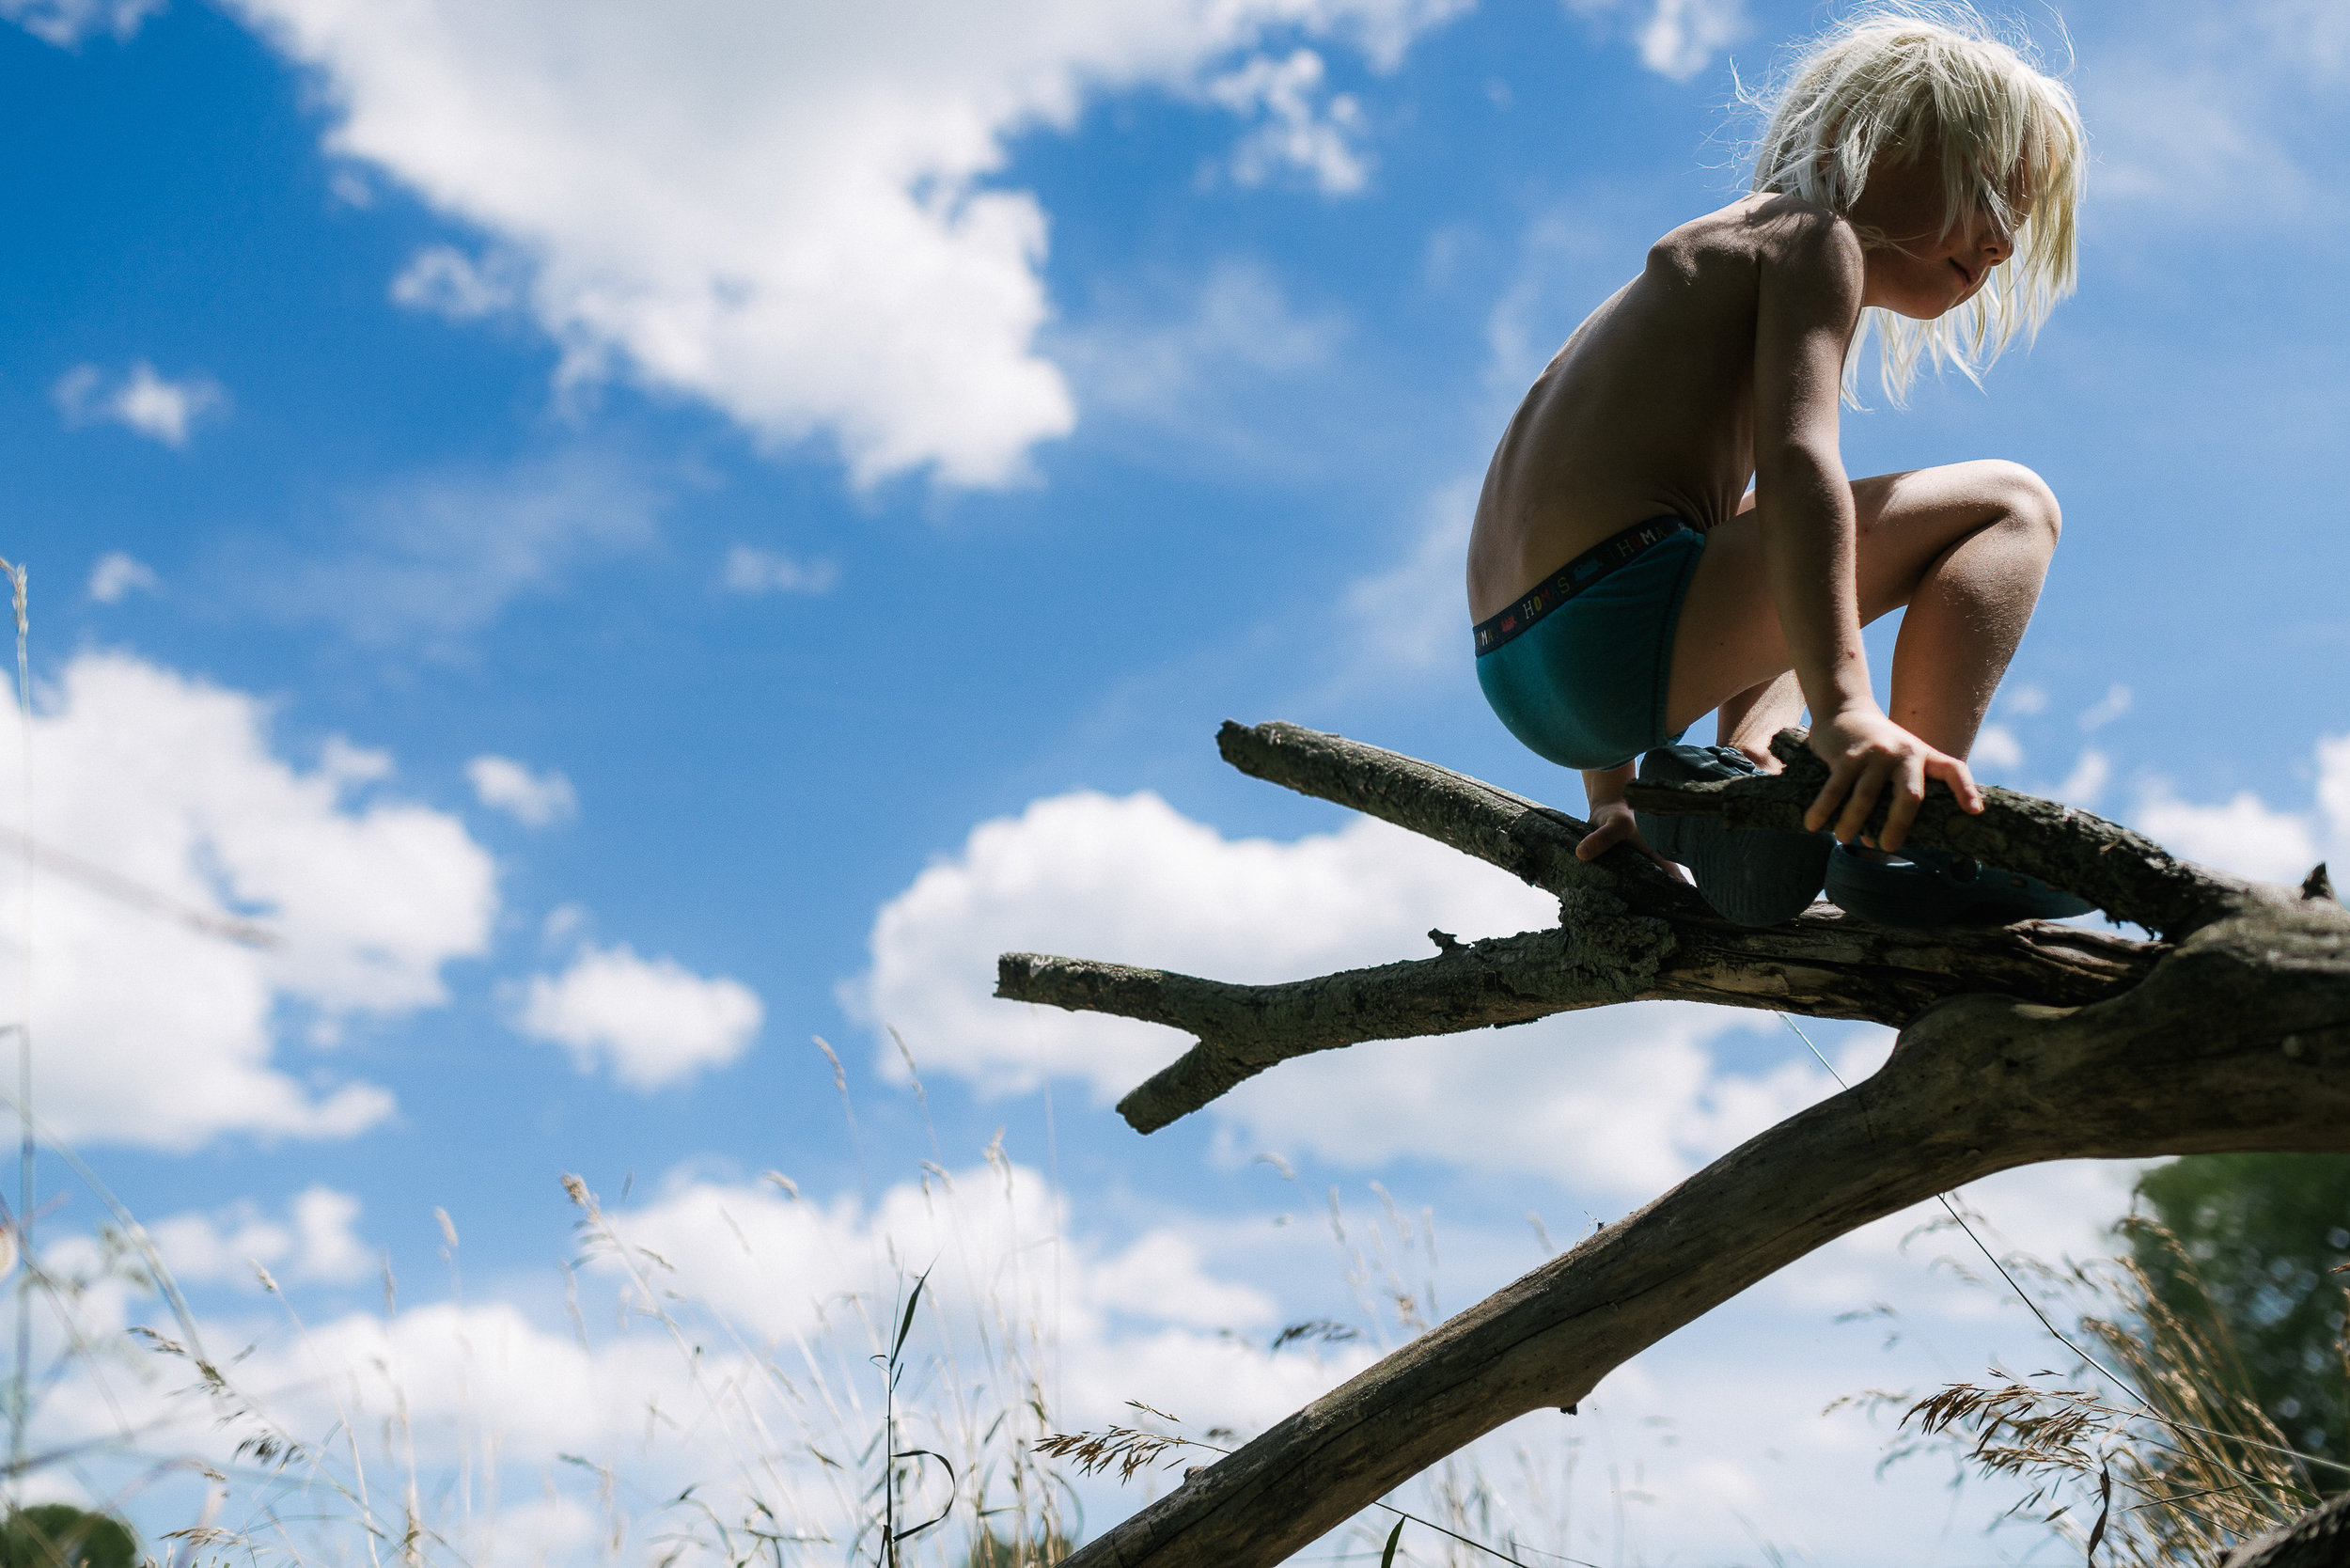 family documentary photography in kingston by viara mileva-145645vm.jpg